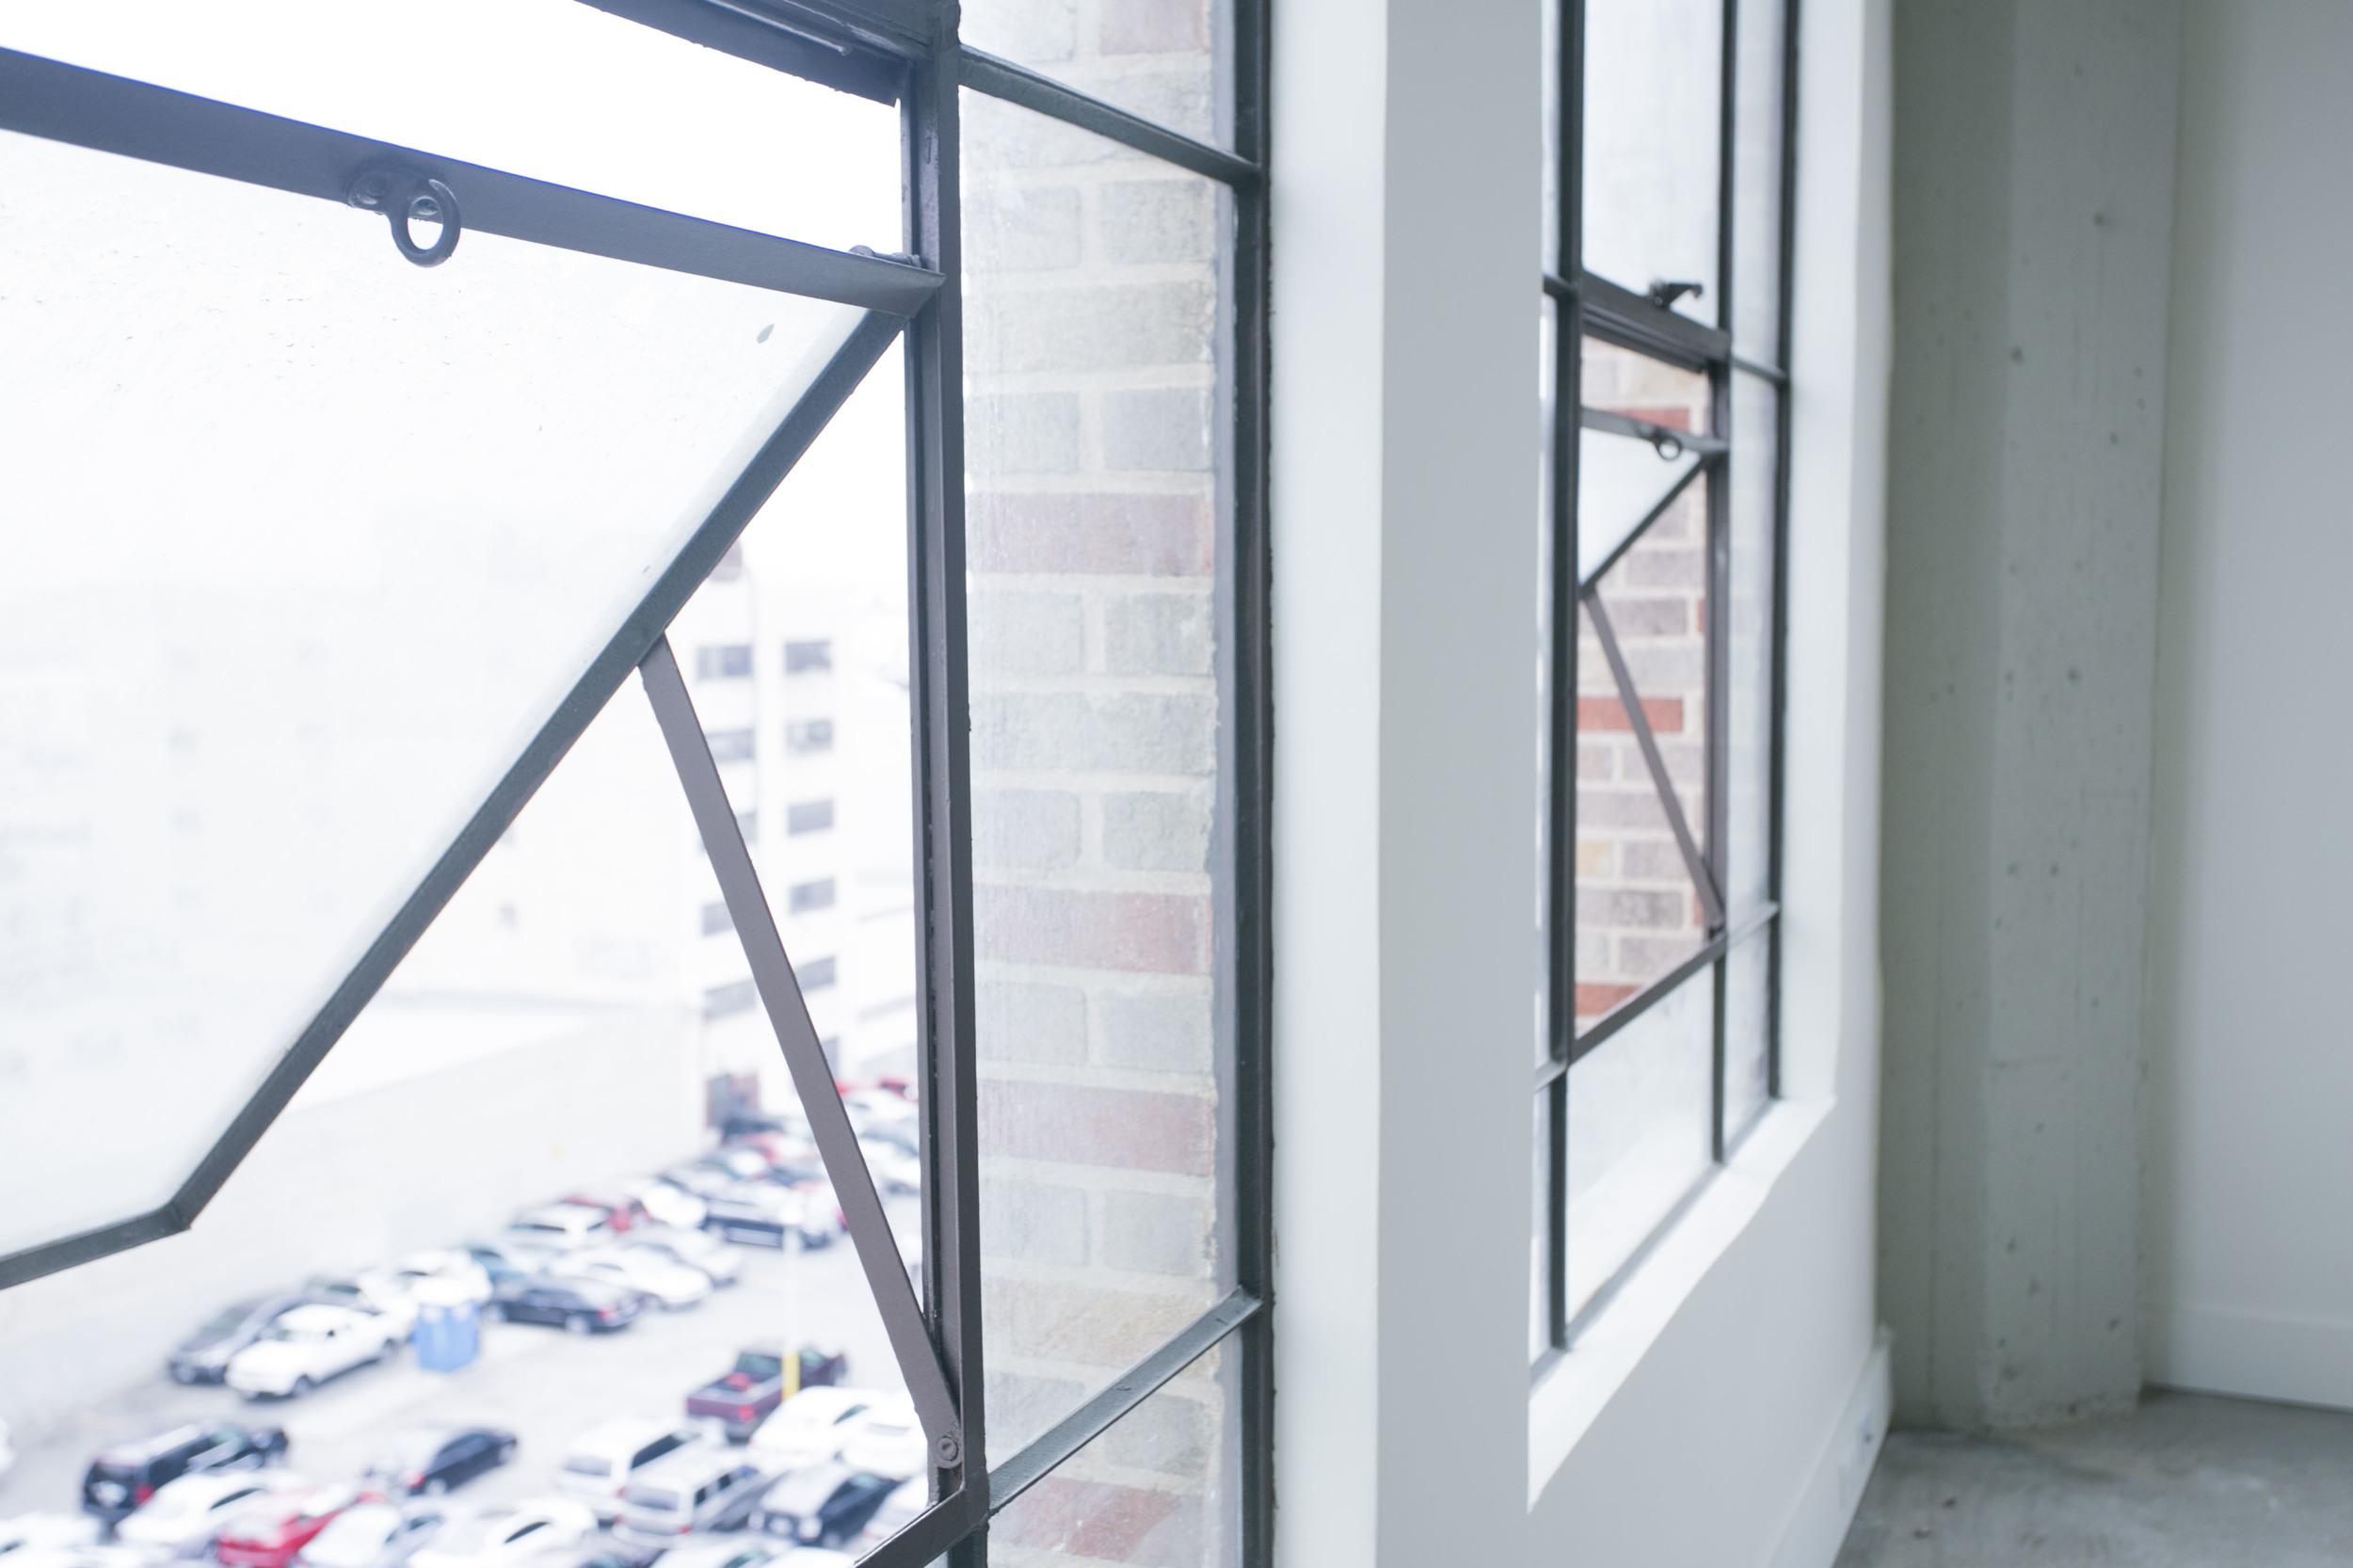 Historic Windows at Garment Lofts